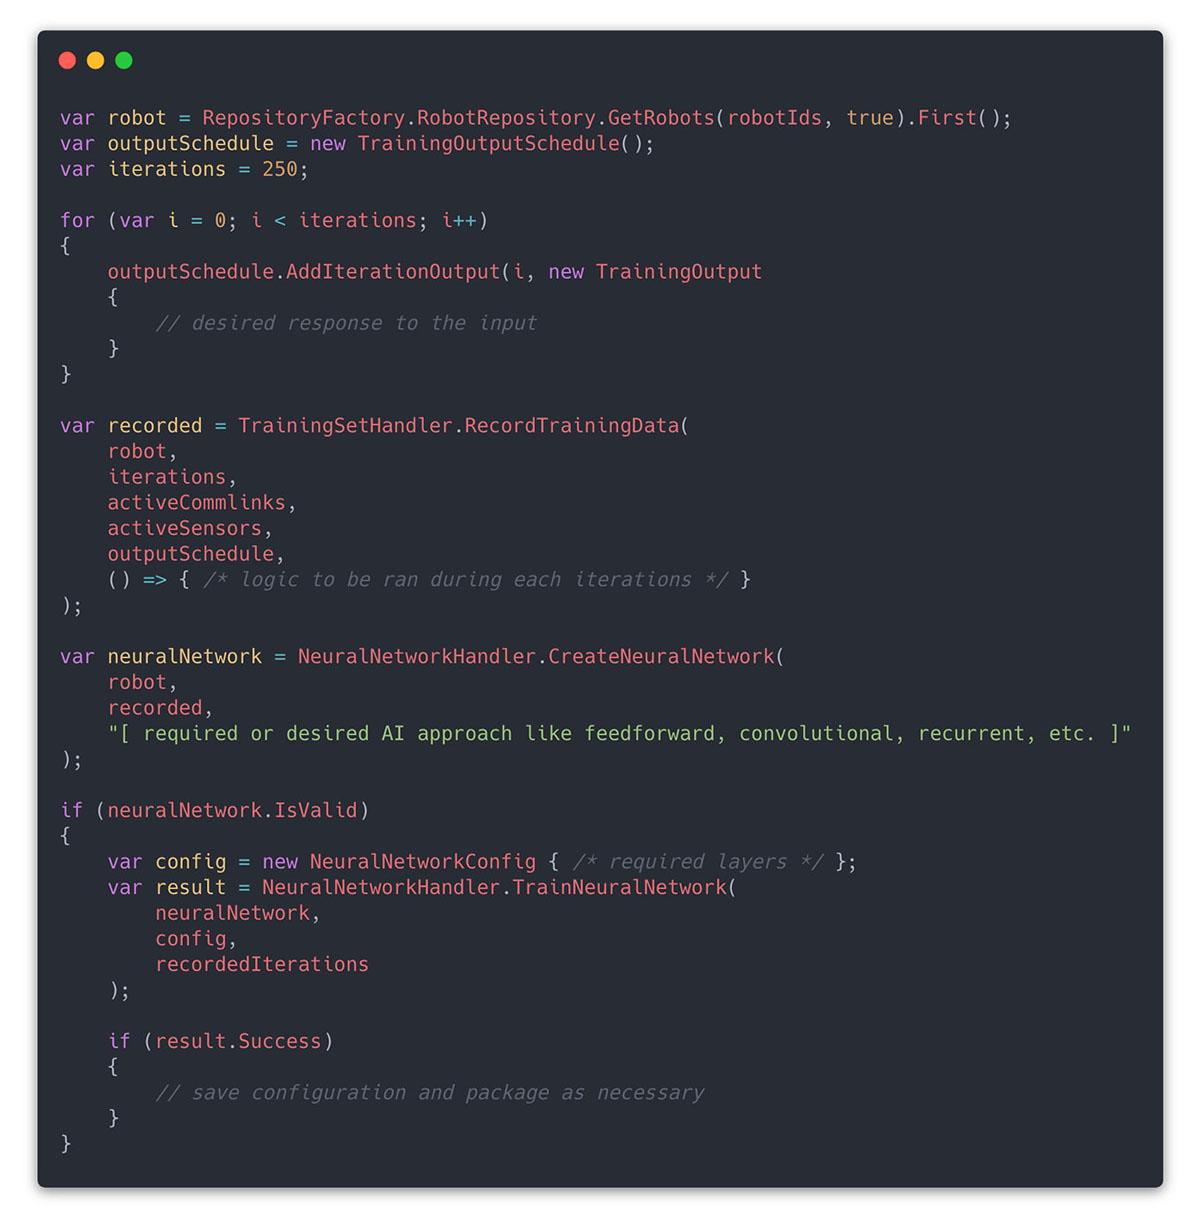 rmx training code snippet